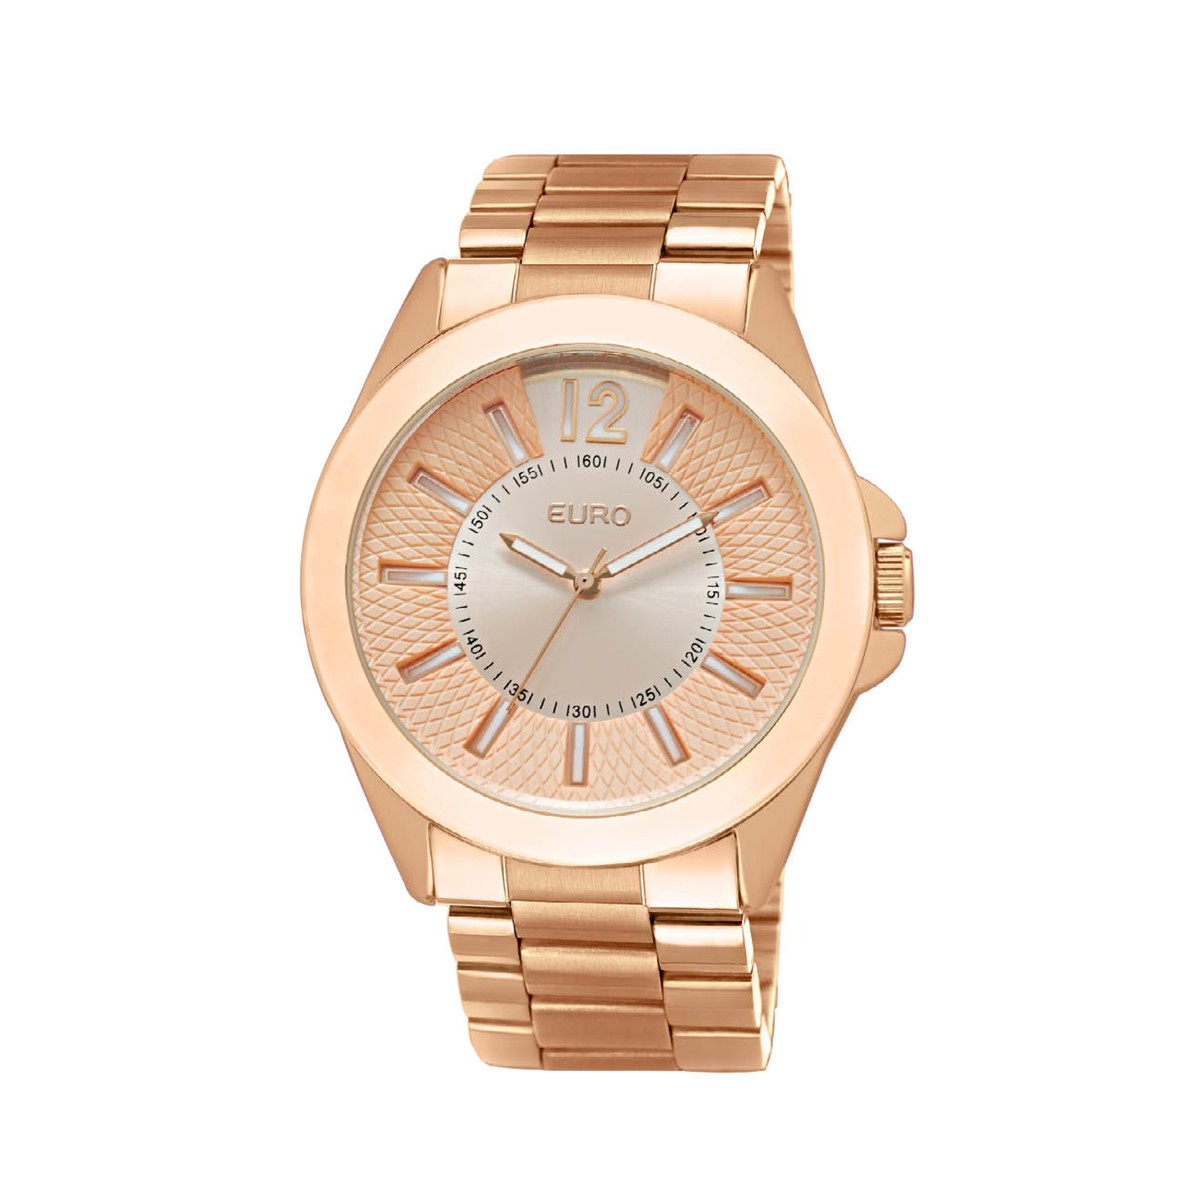 WatchX  Relógio Feminino Analógico Euro Offida EU2035RR 4T - Rose Gold f3622f0000